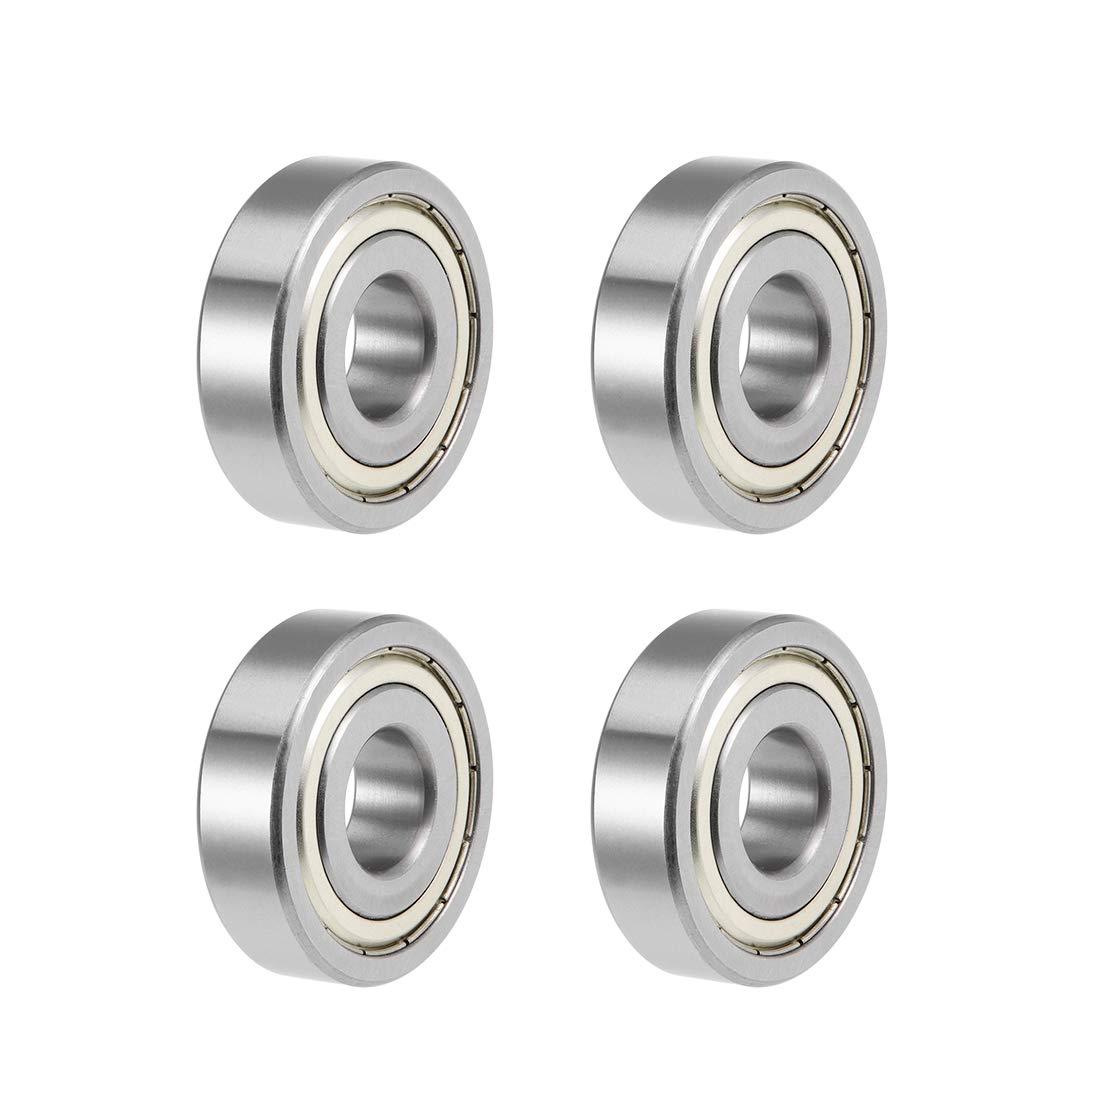 uxcell 1638ZZ Deep Groove Ball Bearings Z2 3/4 X 2 X 9/16inch Double Shielded Chrome Steel 4pcs